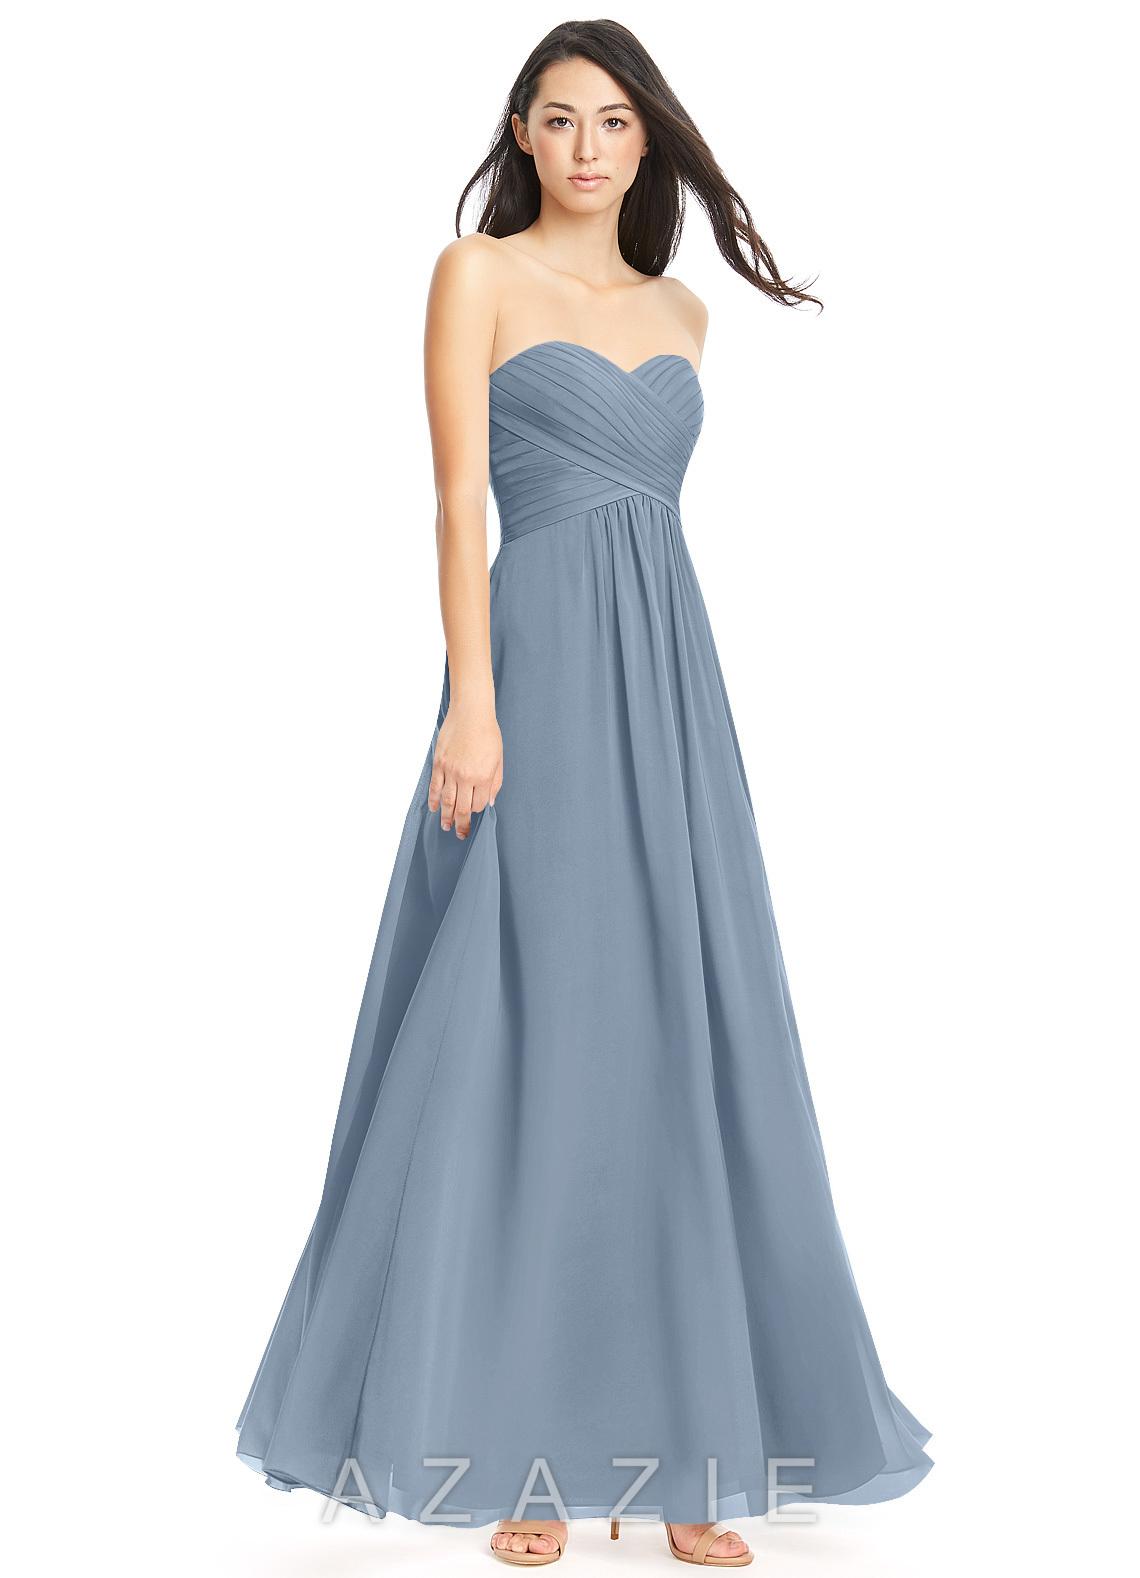 061239c7ad8 Azazie Yazmin Bridesmaid Dress - Dusty Blue